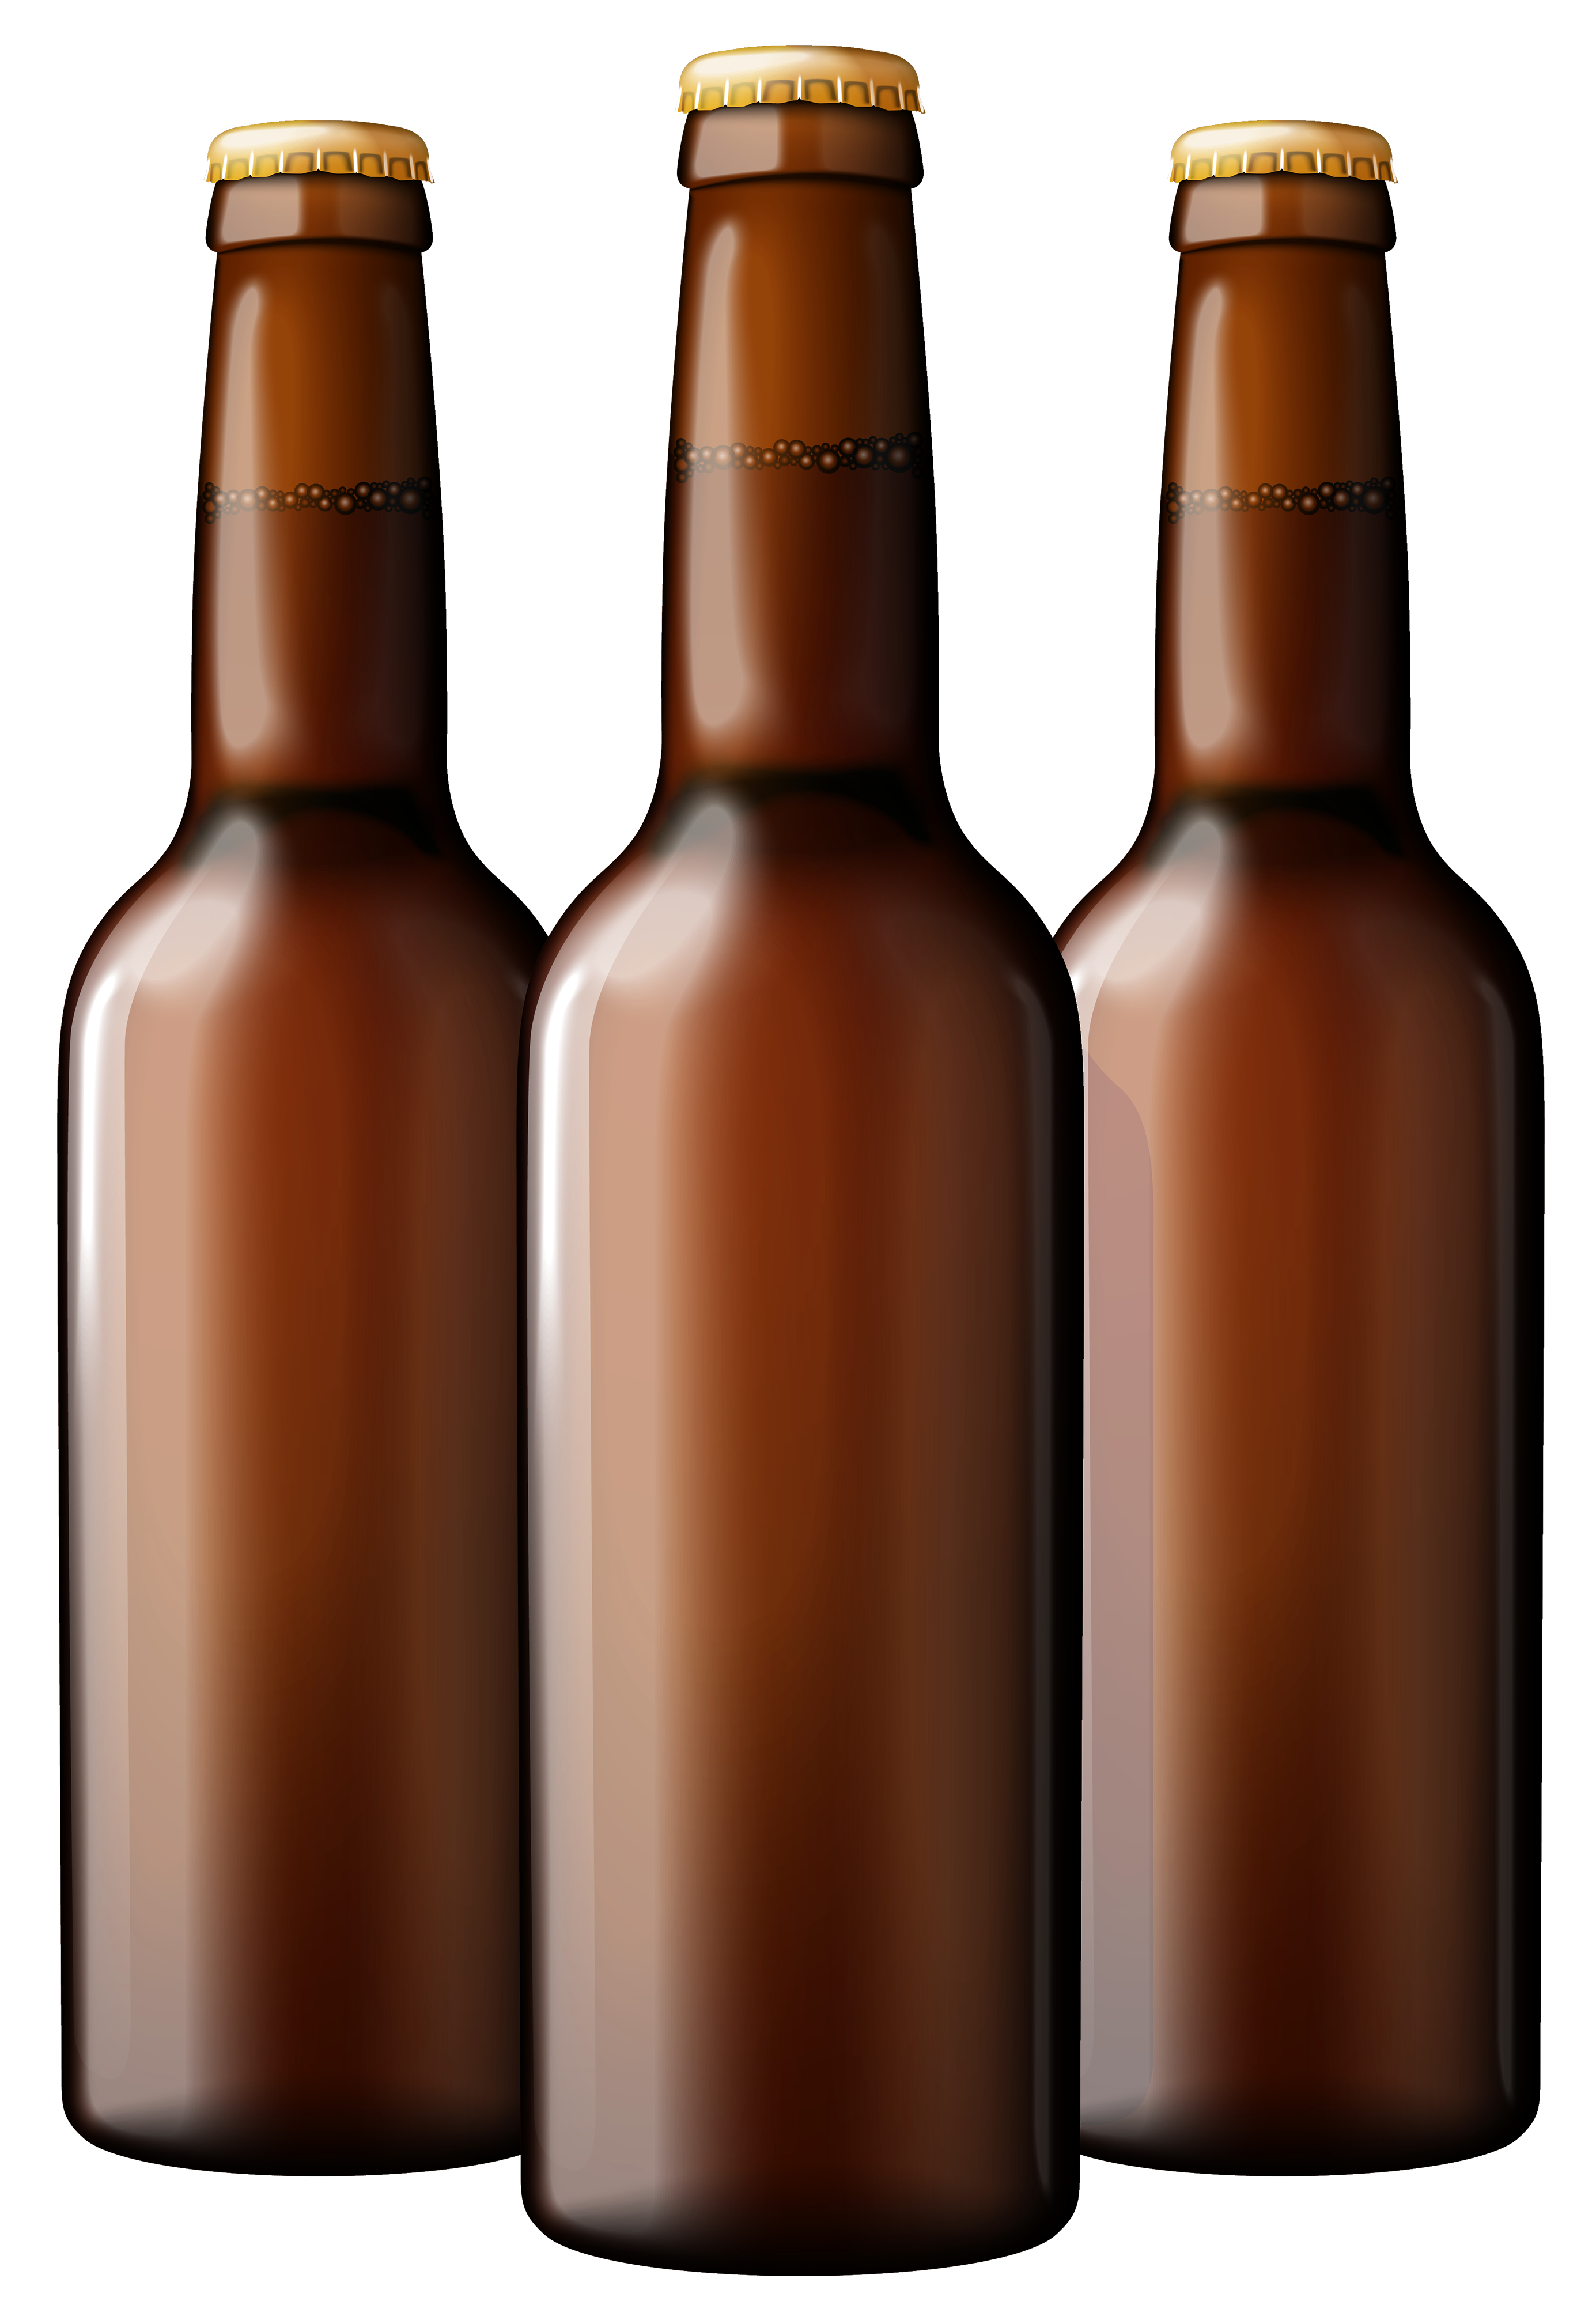 Beer Bottle PNG HD - 124222